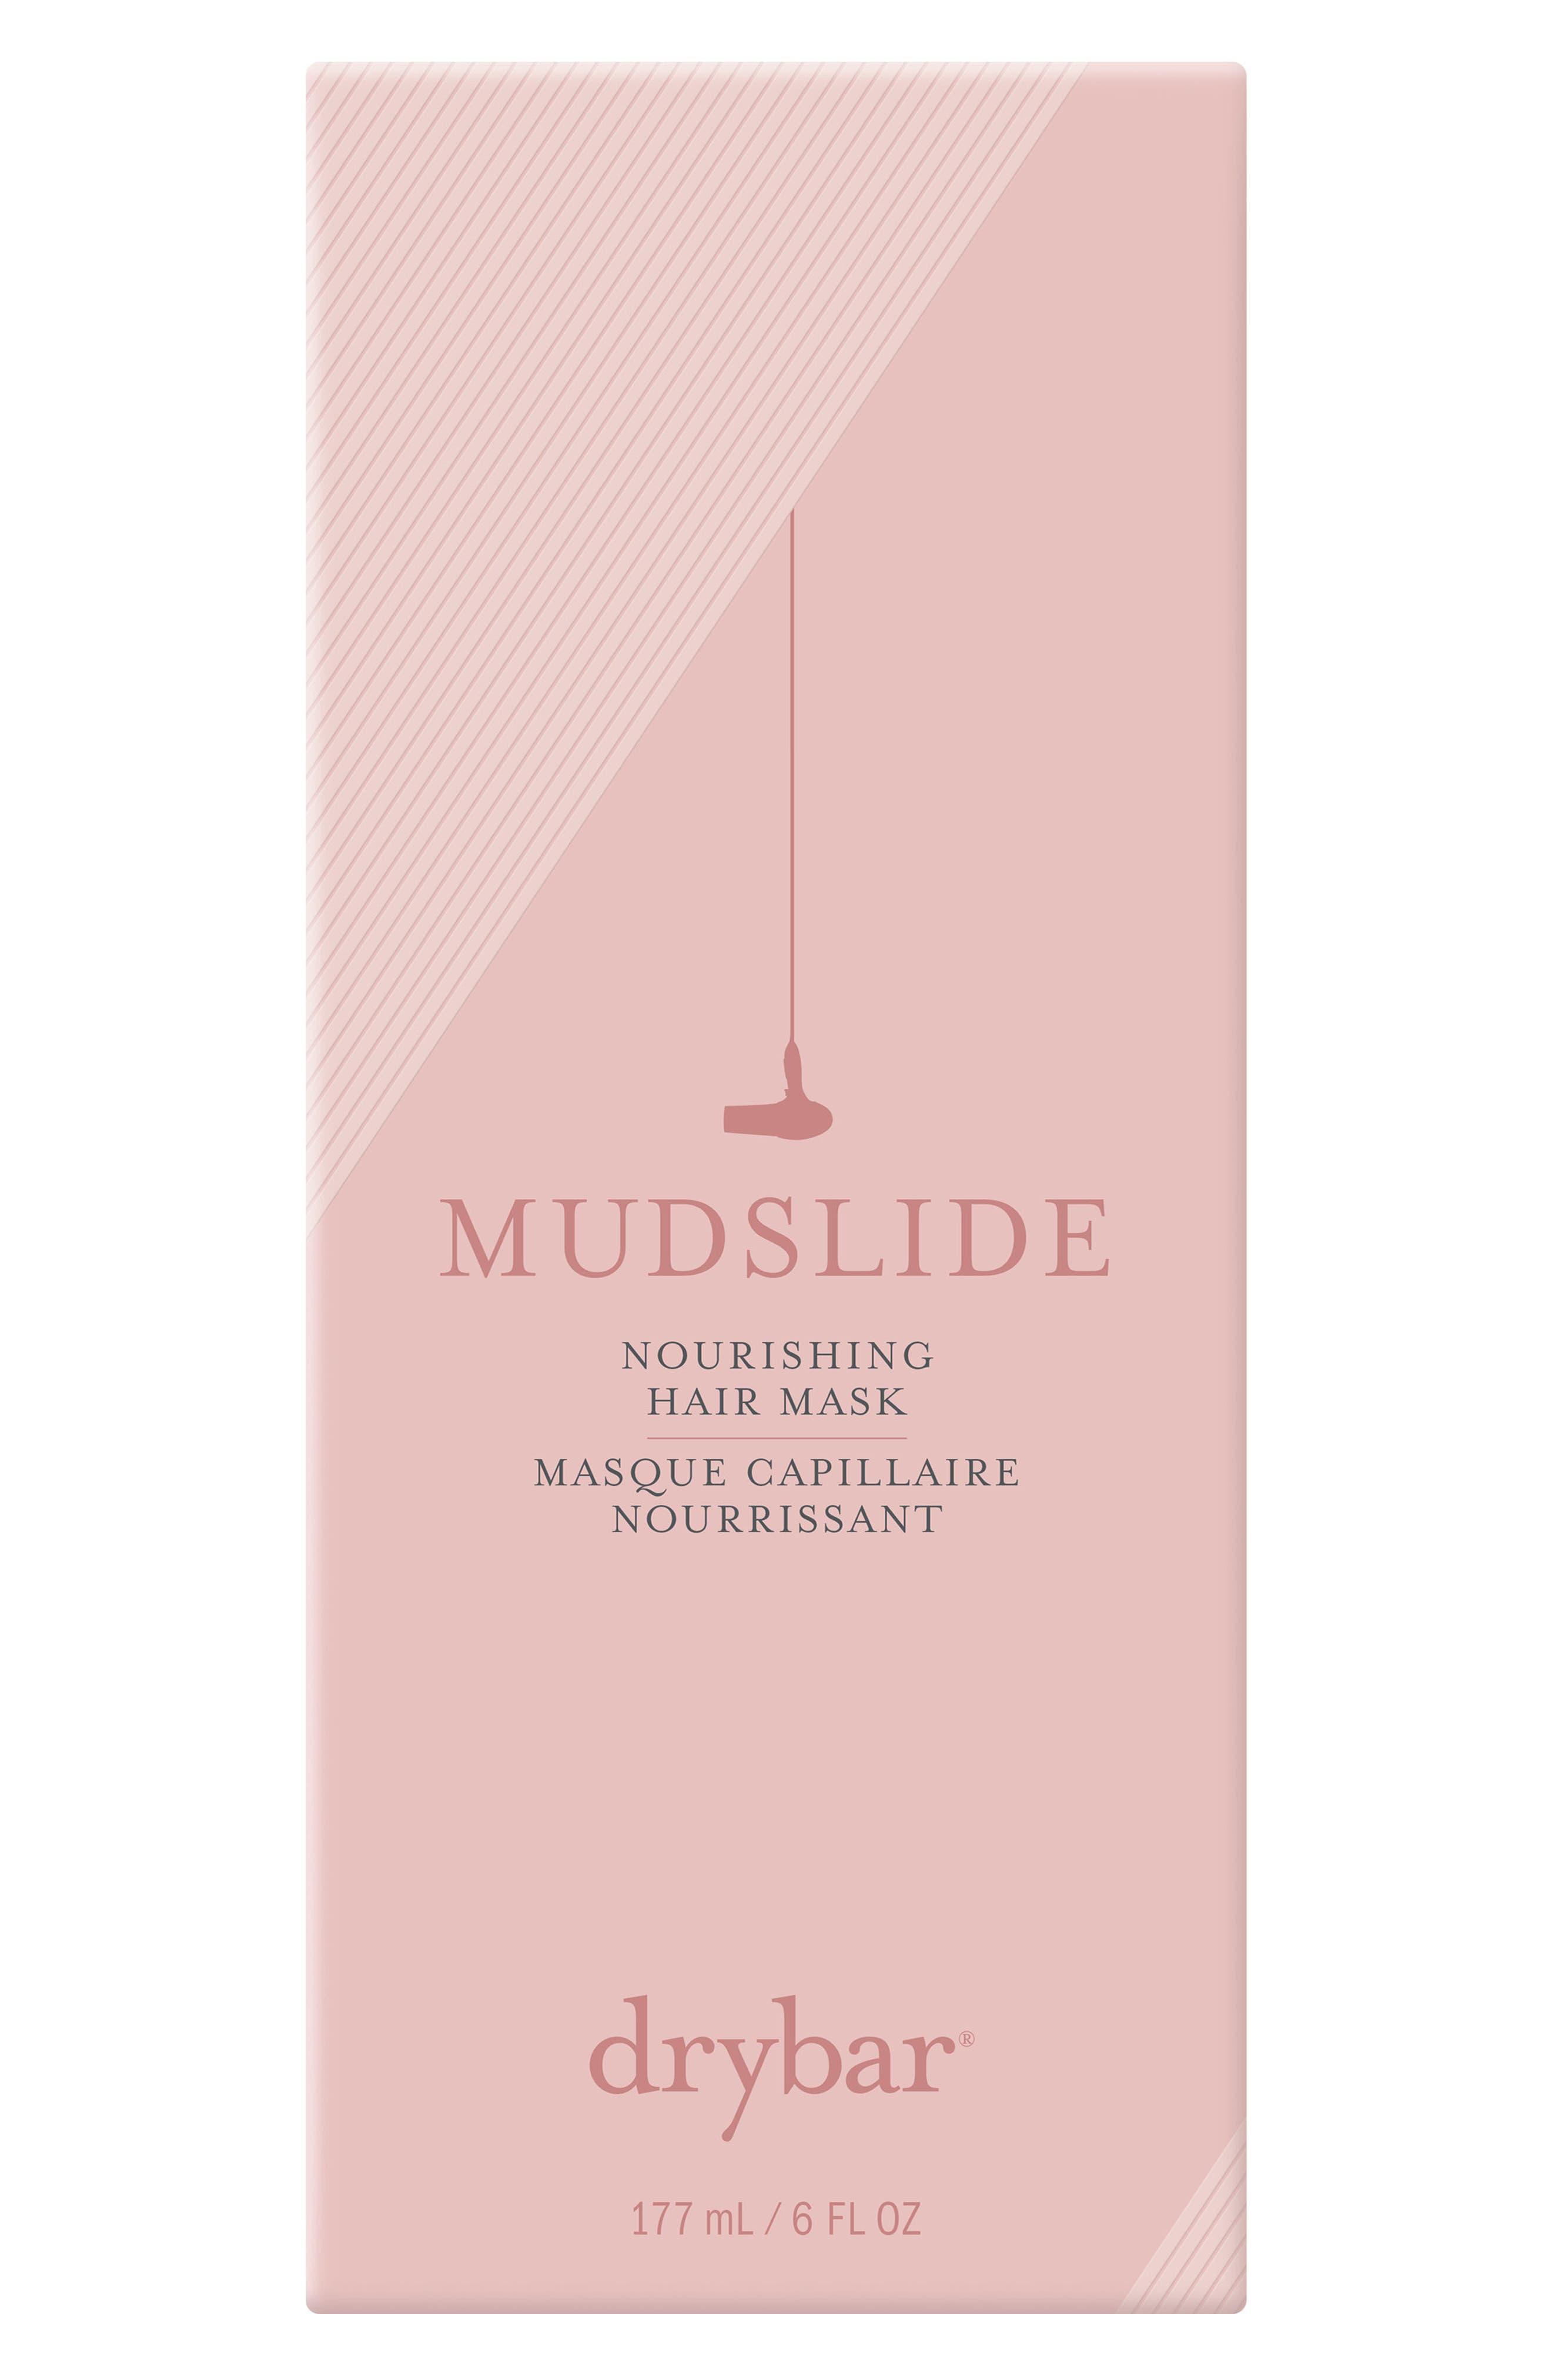 Mudslide Nourishing Hair Mask,                             Alternate thumbnail 2, color,                             No Color